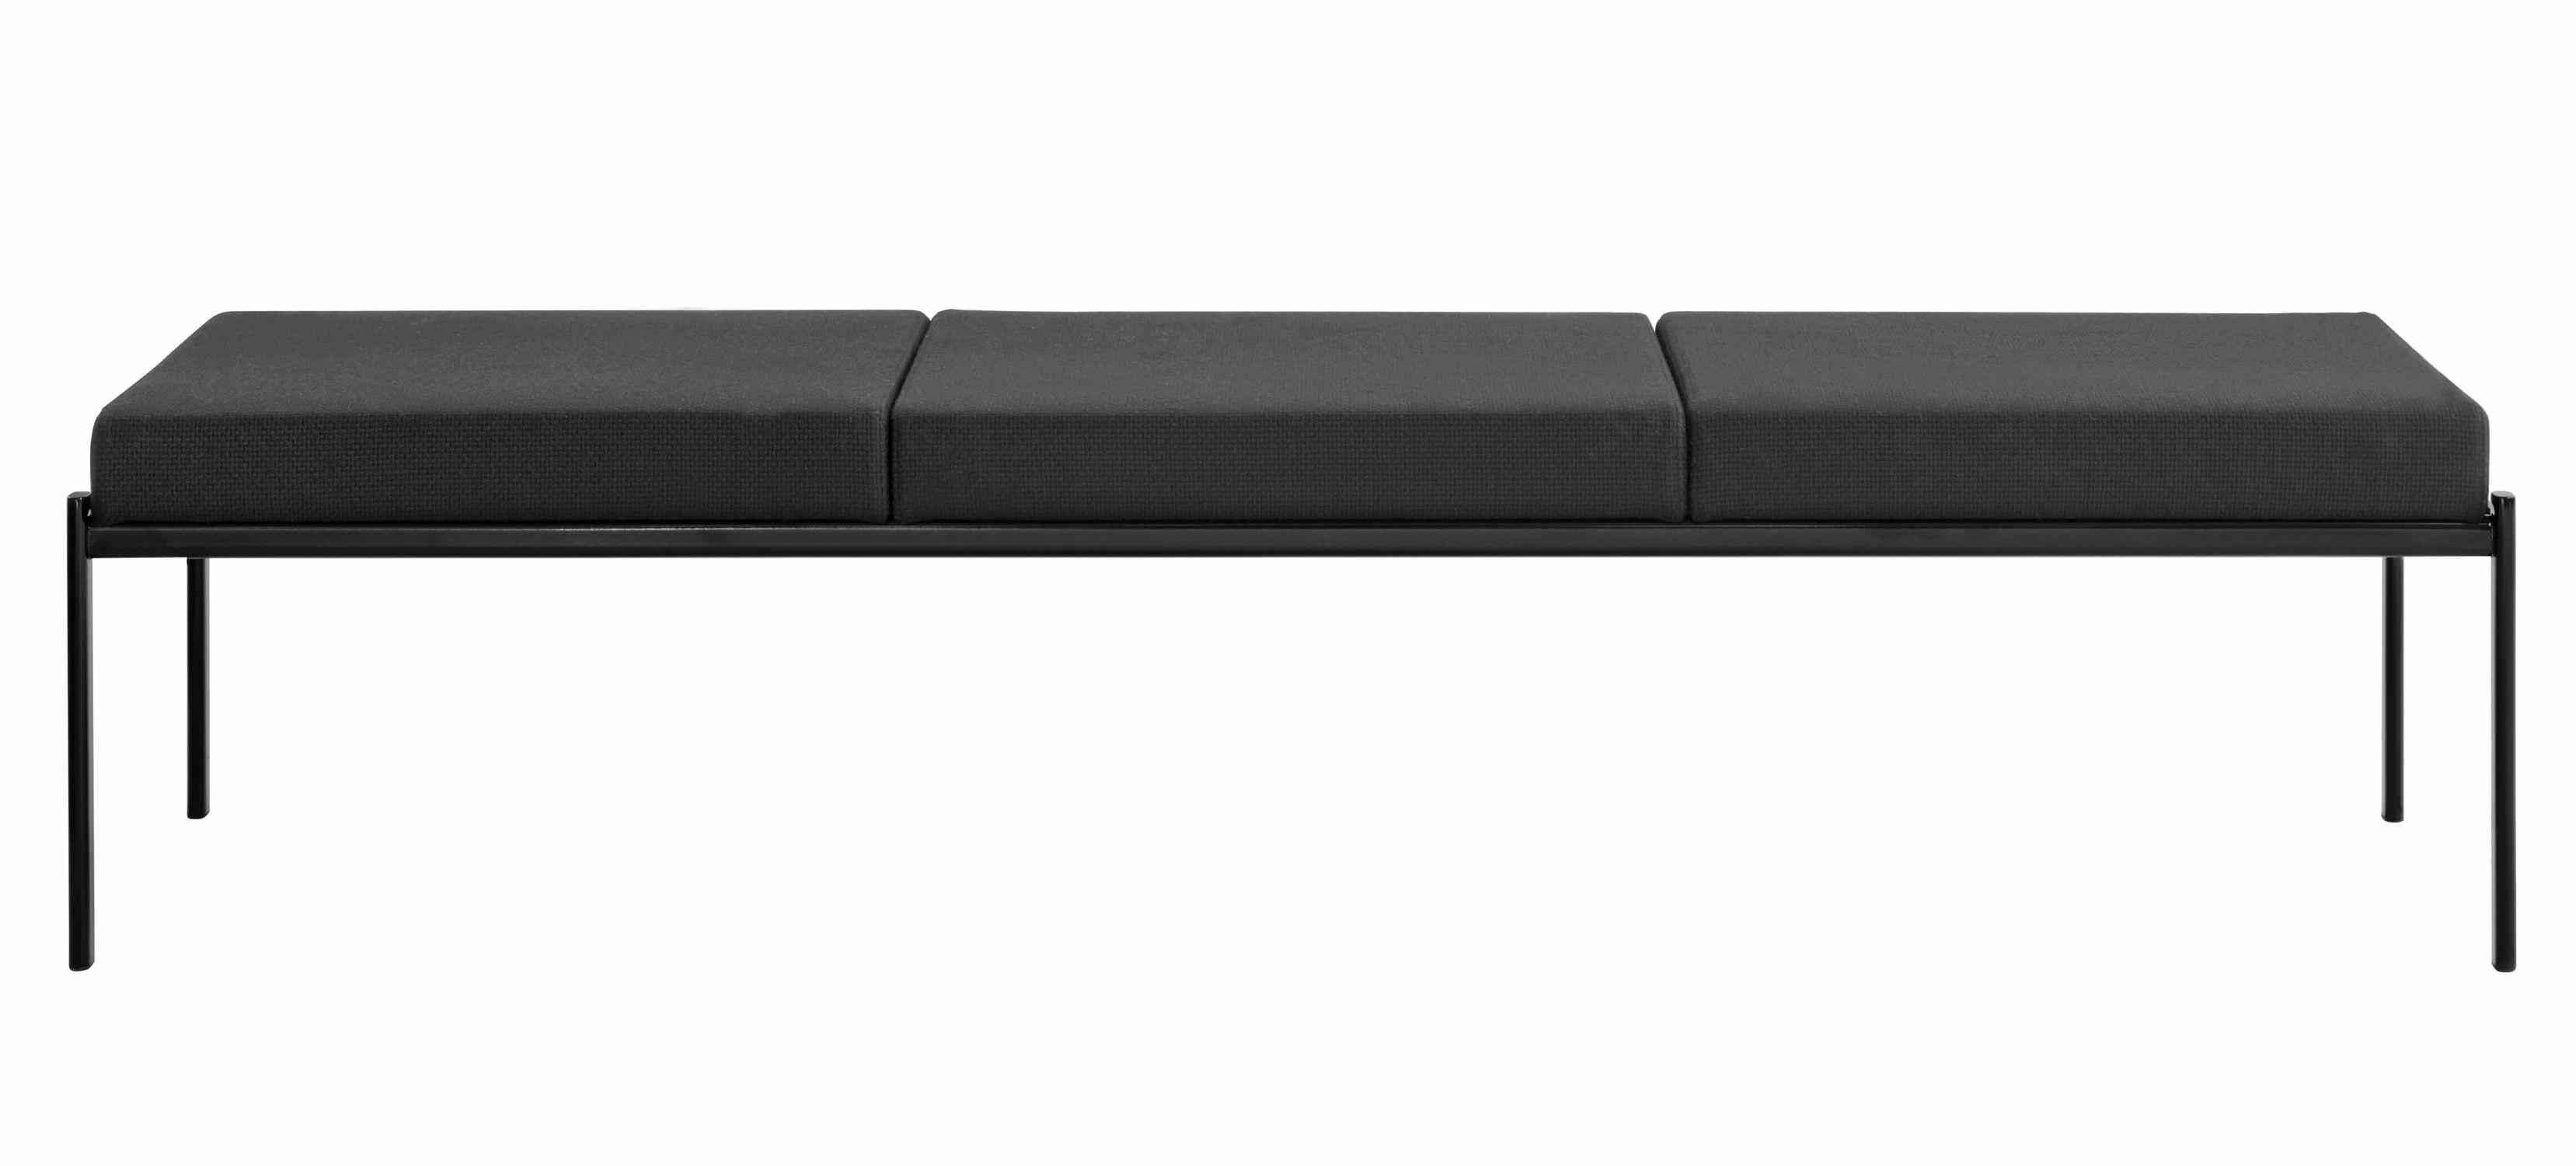 Contemporary upholstered bench / Scandinavian design KIKI by ...